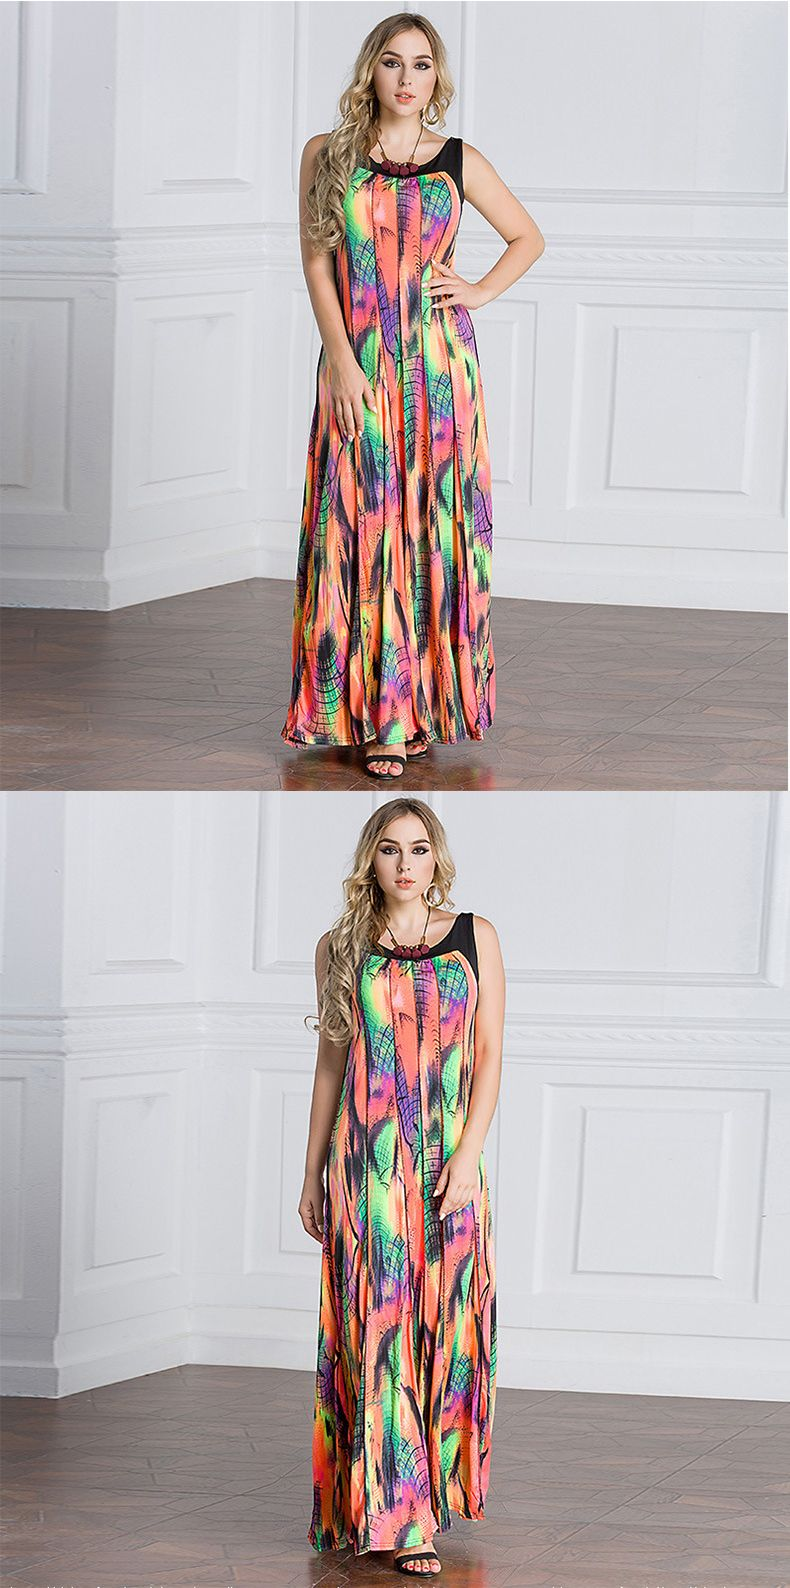 Colorful Summer Maxi Dresses